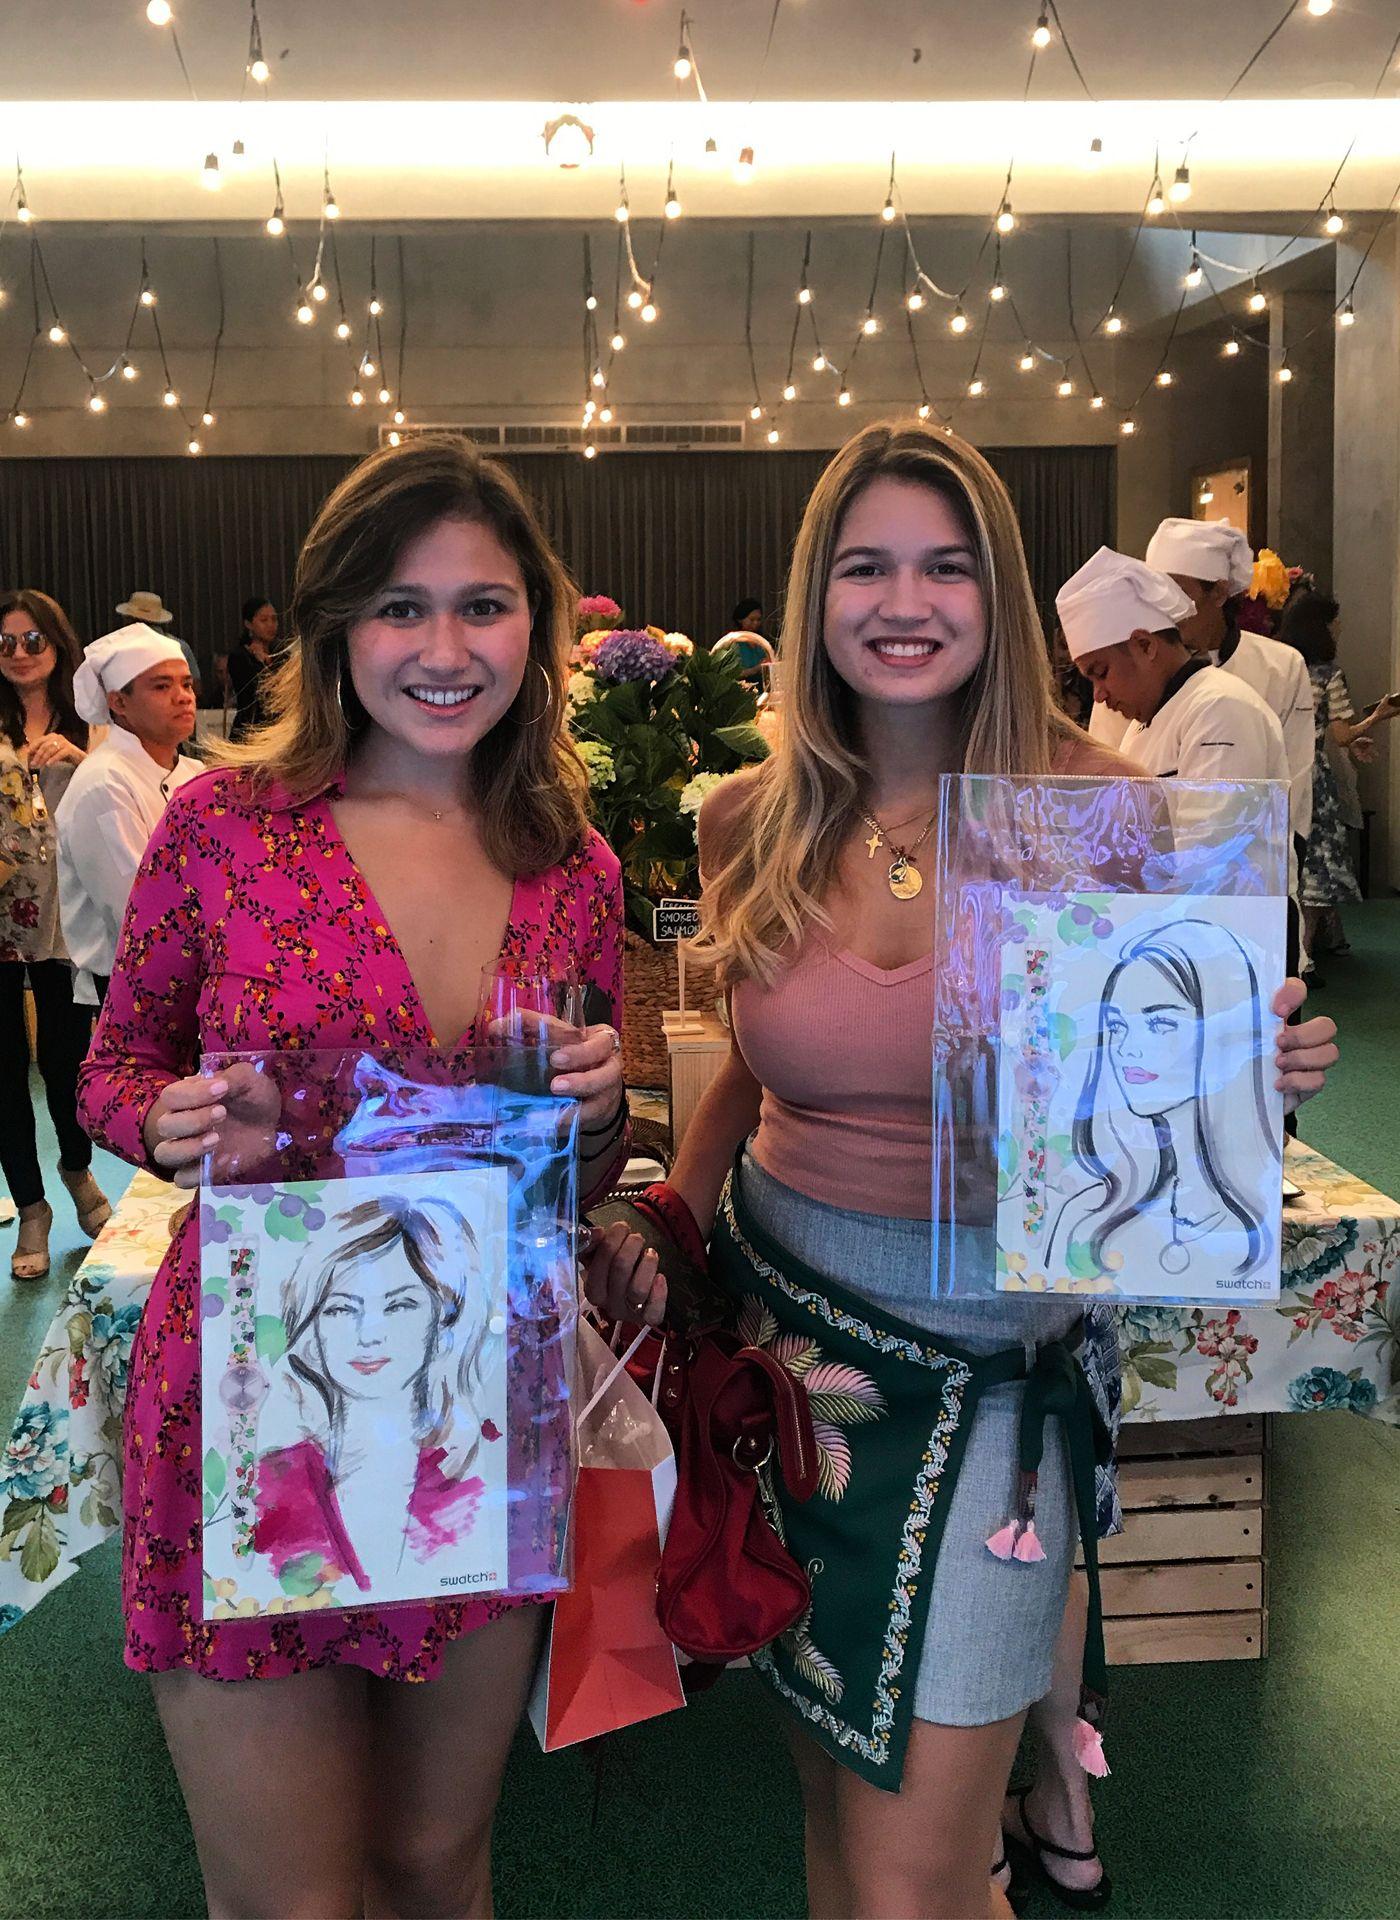 Sophie Saguil and Natalia Pena